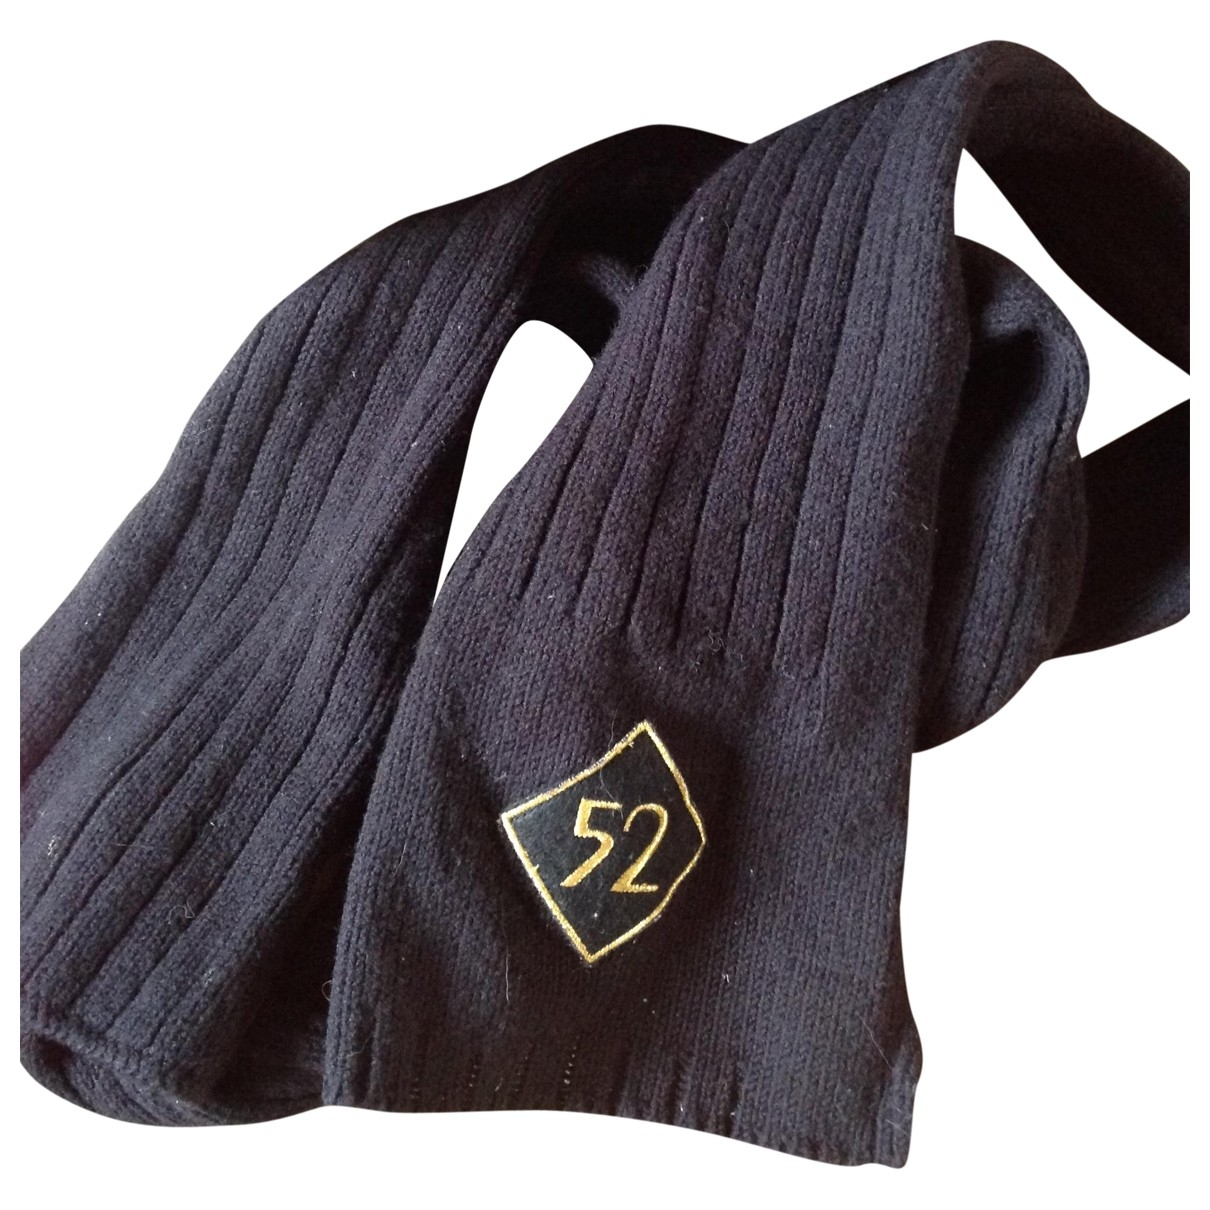 Pañuelo / bufanda de Lana Givenchy